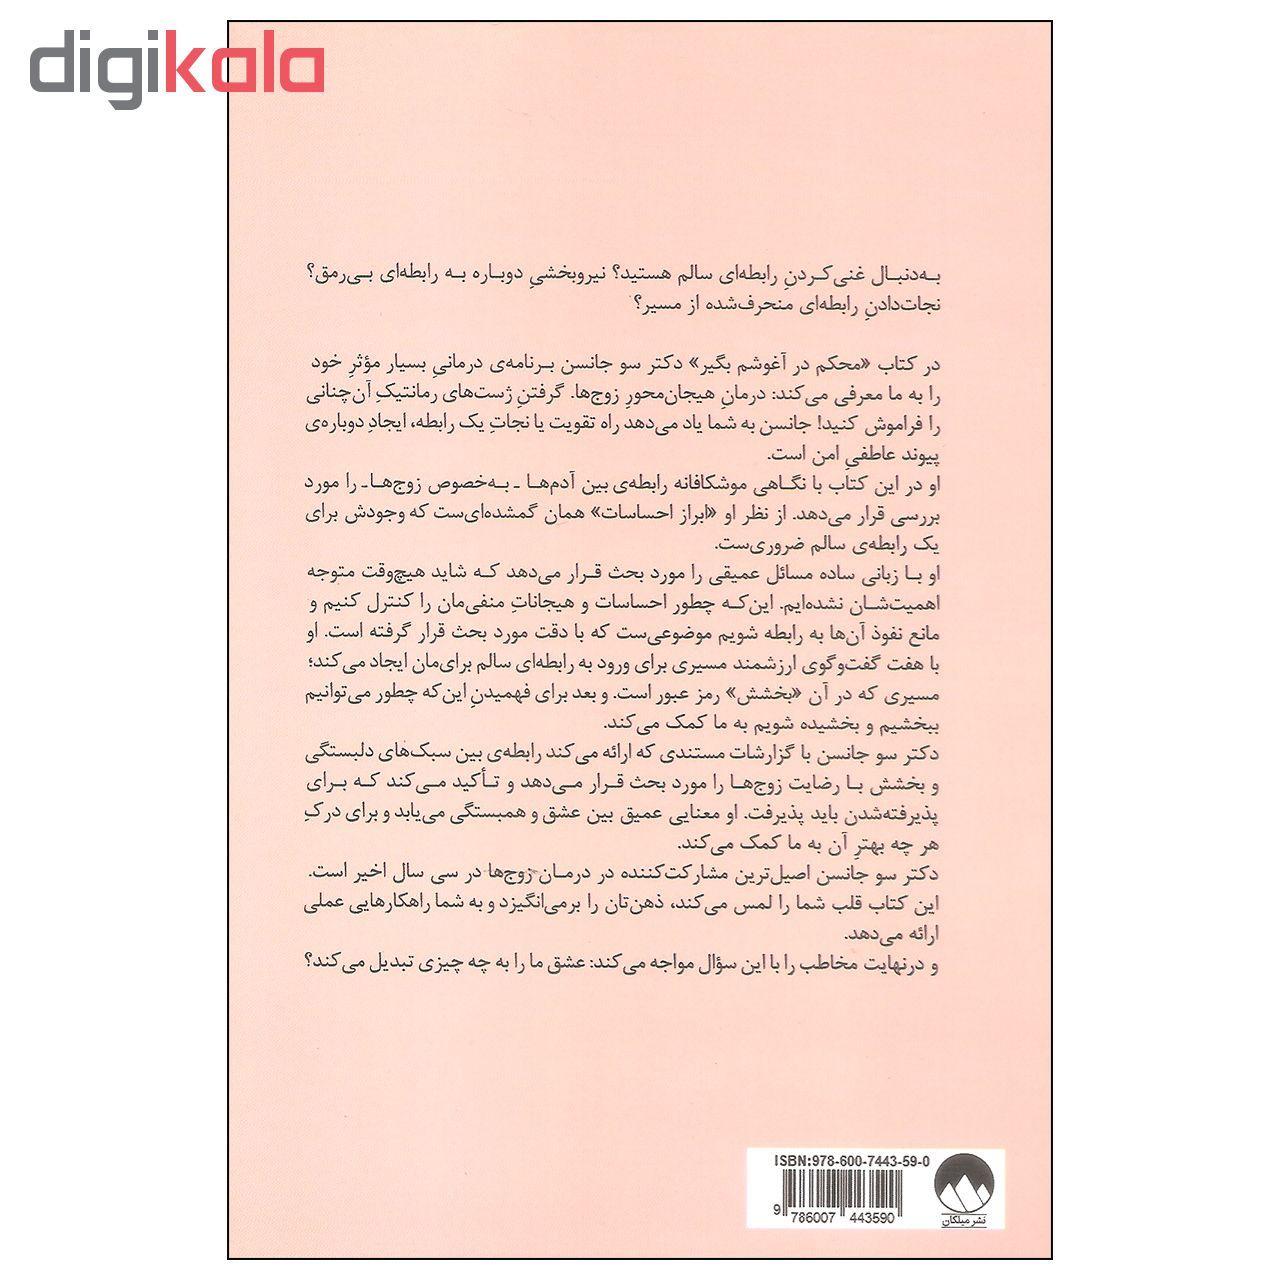 کتاب محکم در آغوشم بگیر اثر دکتر سو جانسن نشر میلکان main 1 2